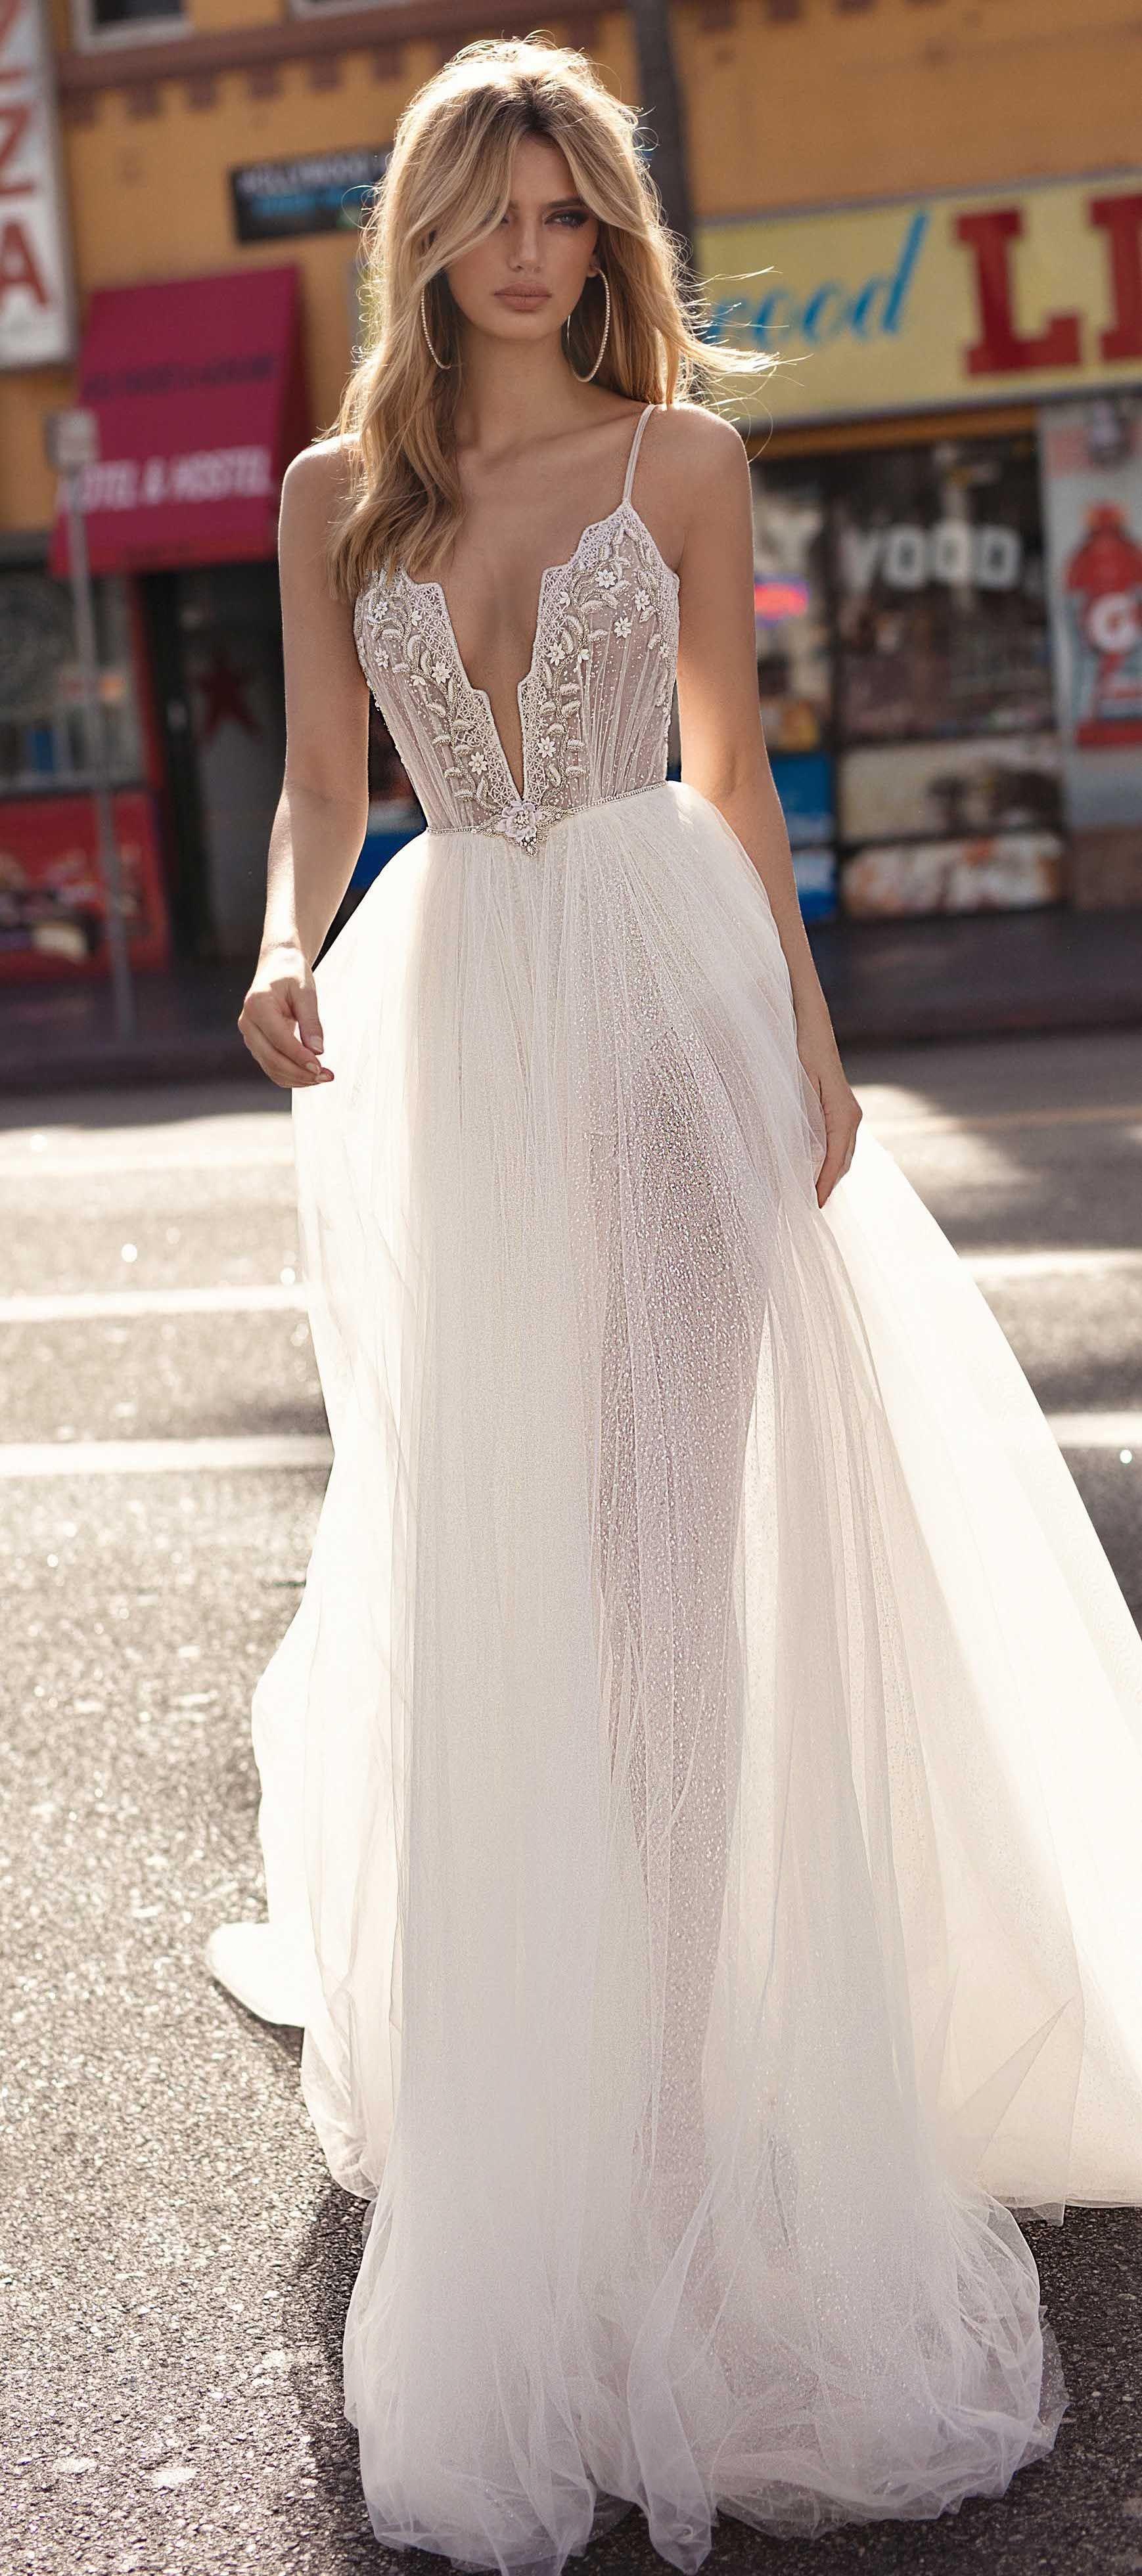 Muse by berta wedding dress ball gown wedding dress with deep v